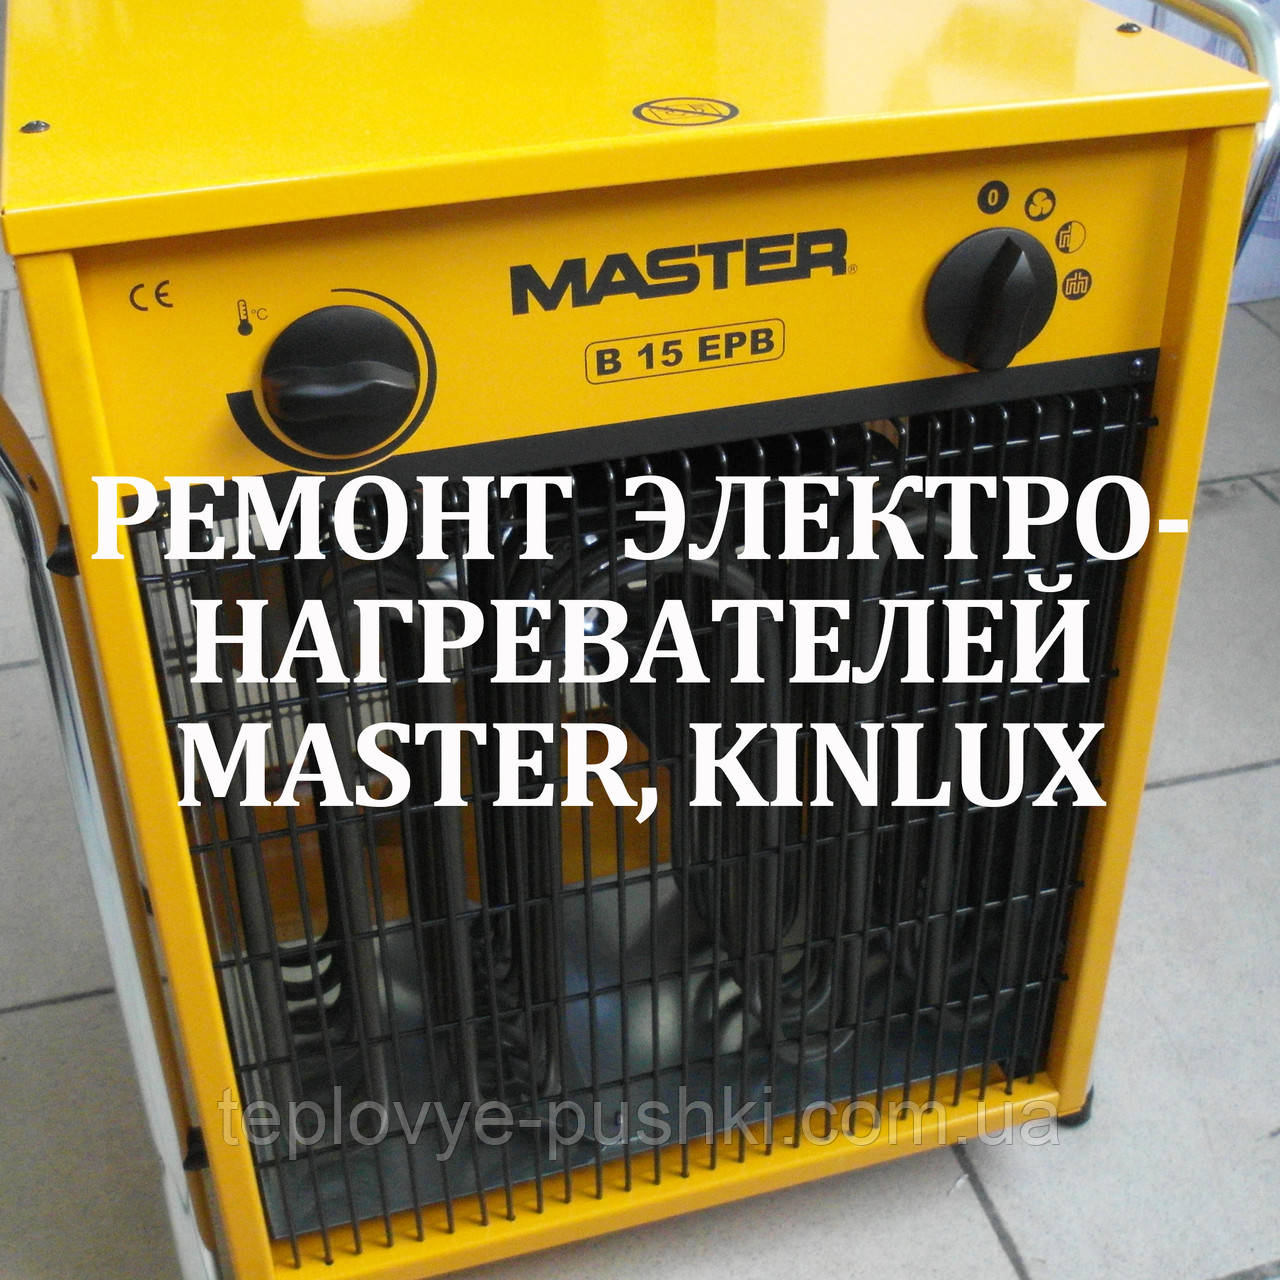 Ремонт электронагревателей MASTER, KINLUX